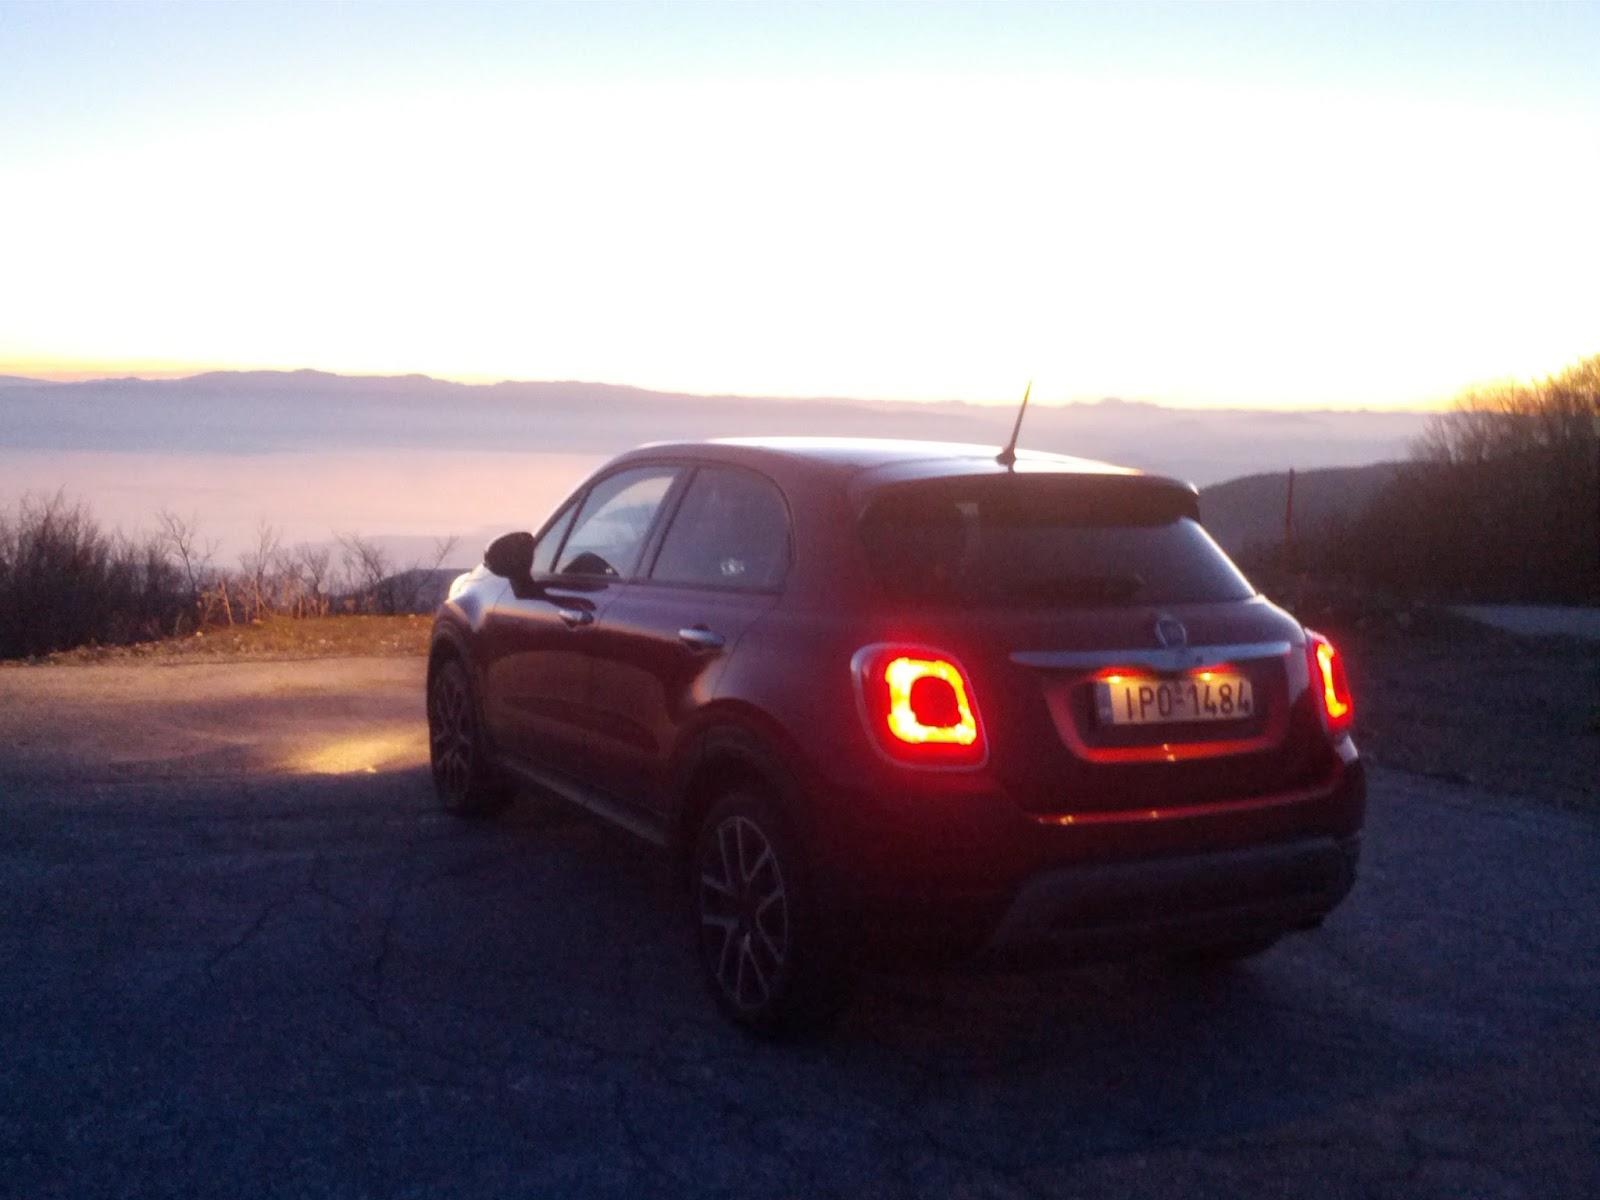 IMG 20151213 172721 Ταξιδεύω με το Fiat 500X στο παγωμένο Πήλιο compact SUV, Crossover, Fiat, Fiat 500X, SUV, TEST, zblog, ΔΟΚΙΜΕΣ, Ταξίδι